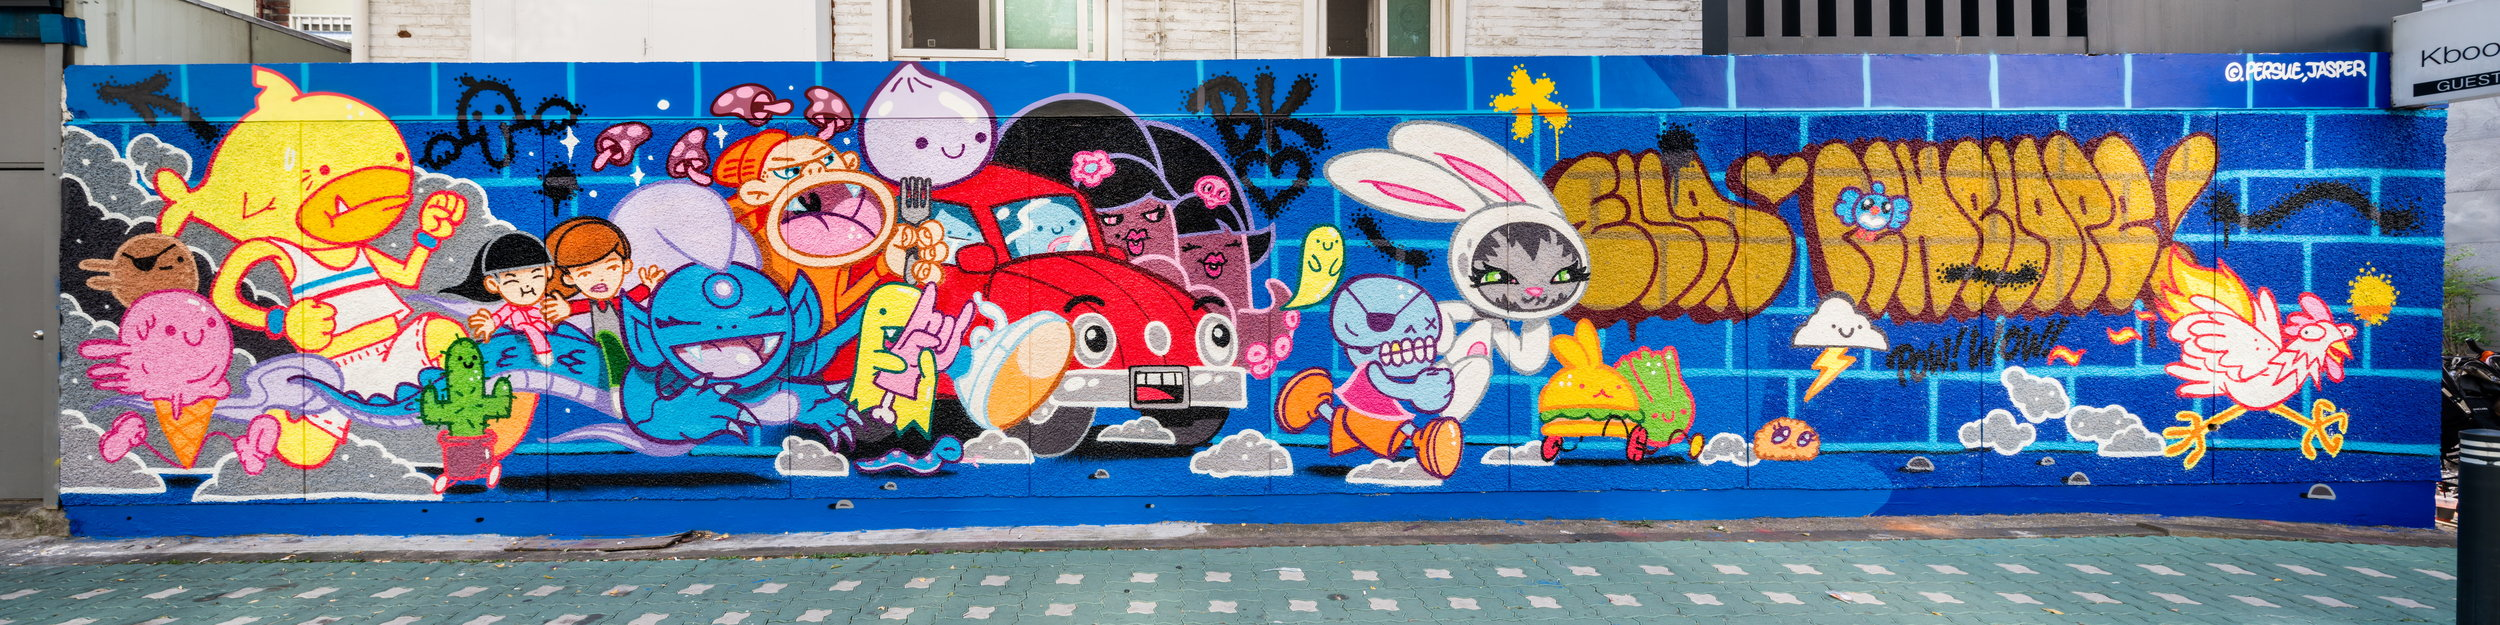 """KFC - Korean Fried Chicken"" collaboration with Jasper Wong (Seoul, South Korea 2016)"